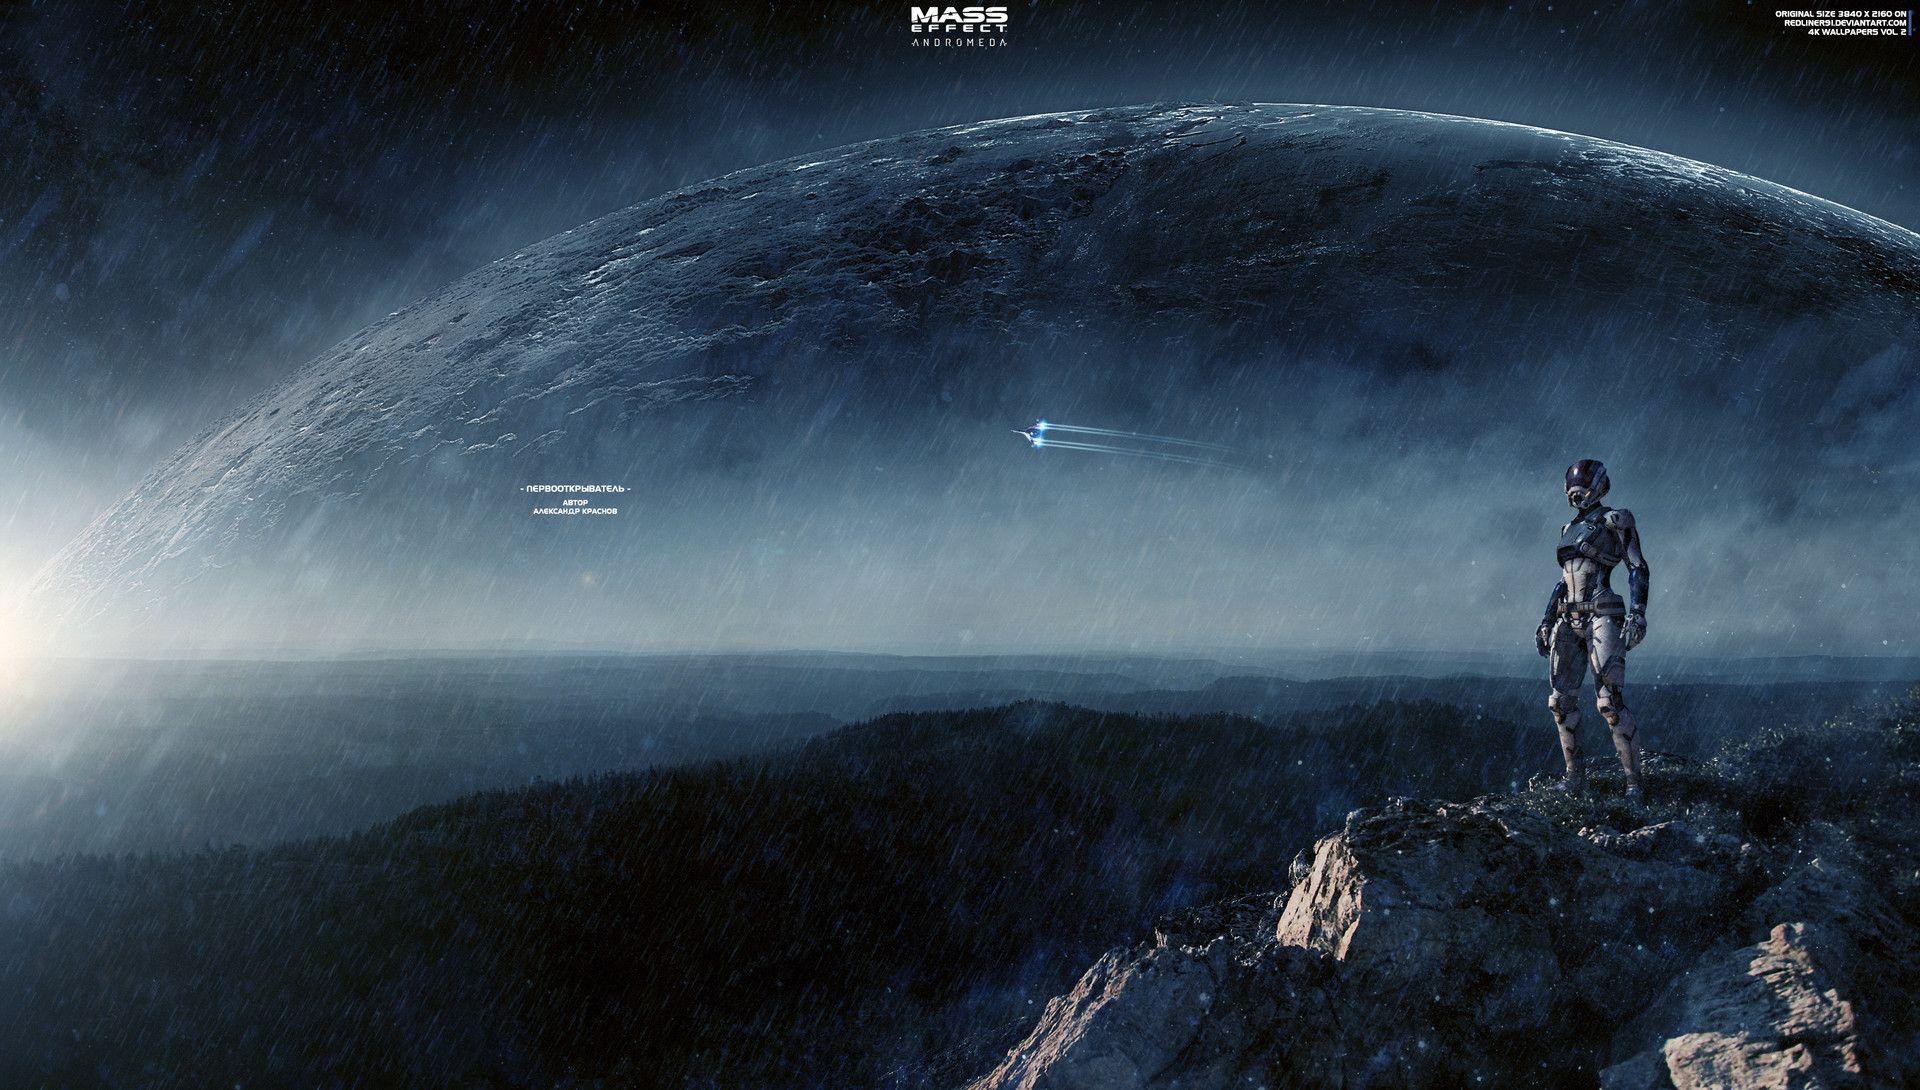 Artstation Discoverer Mass Effect Andromeda 4k Alexander Manakhov In 2020 Mass Effect Background Images Mass Effect Universe